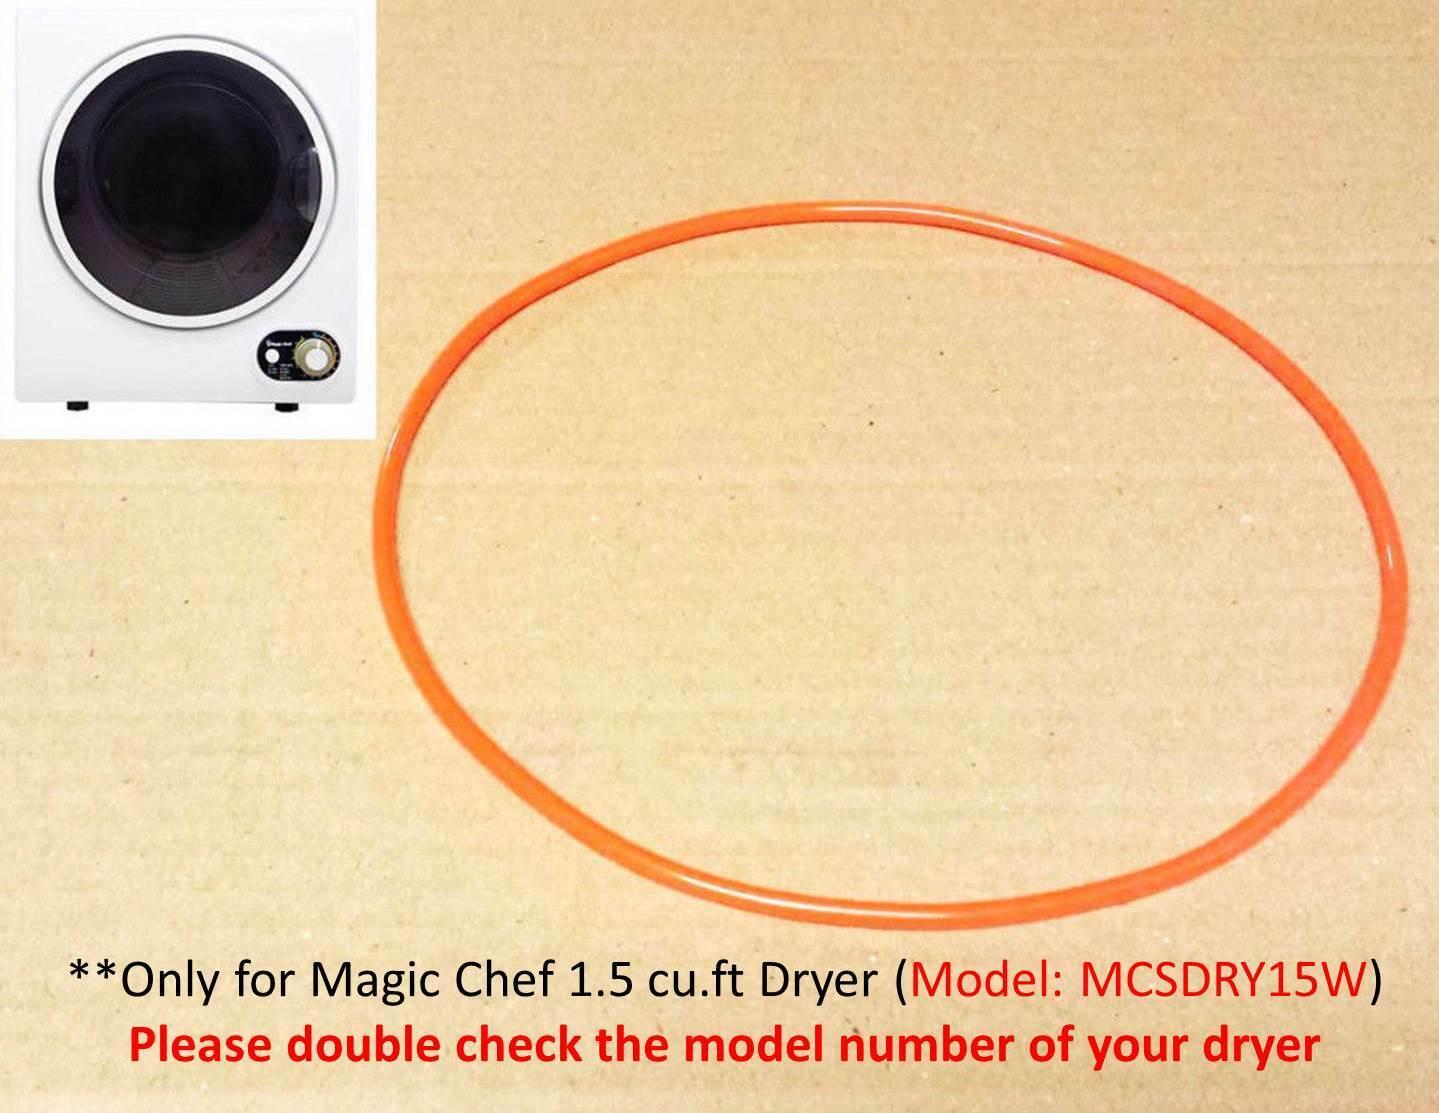 Portable Dryer Blower Fan Belt for Magic Chef 1.5 cu.ft. Com